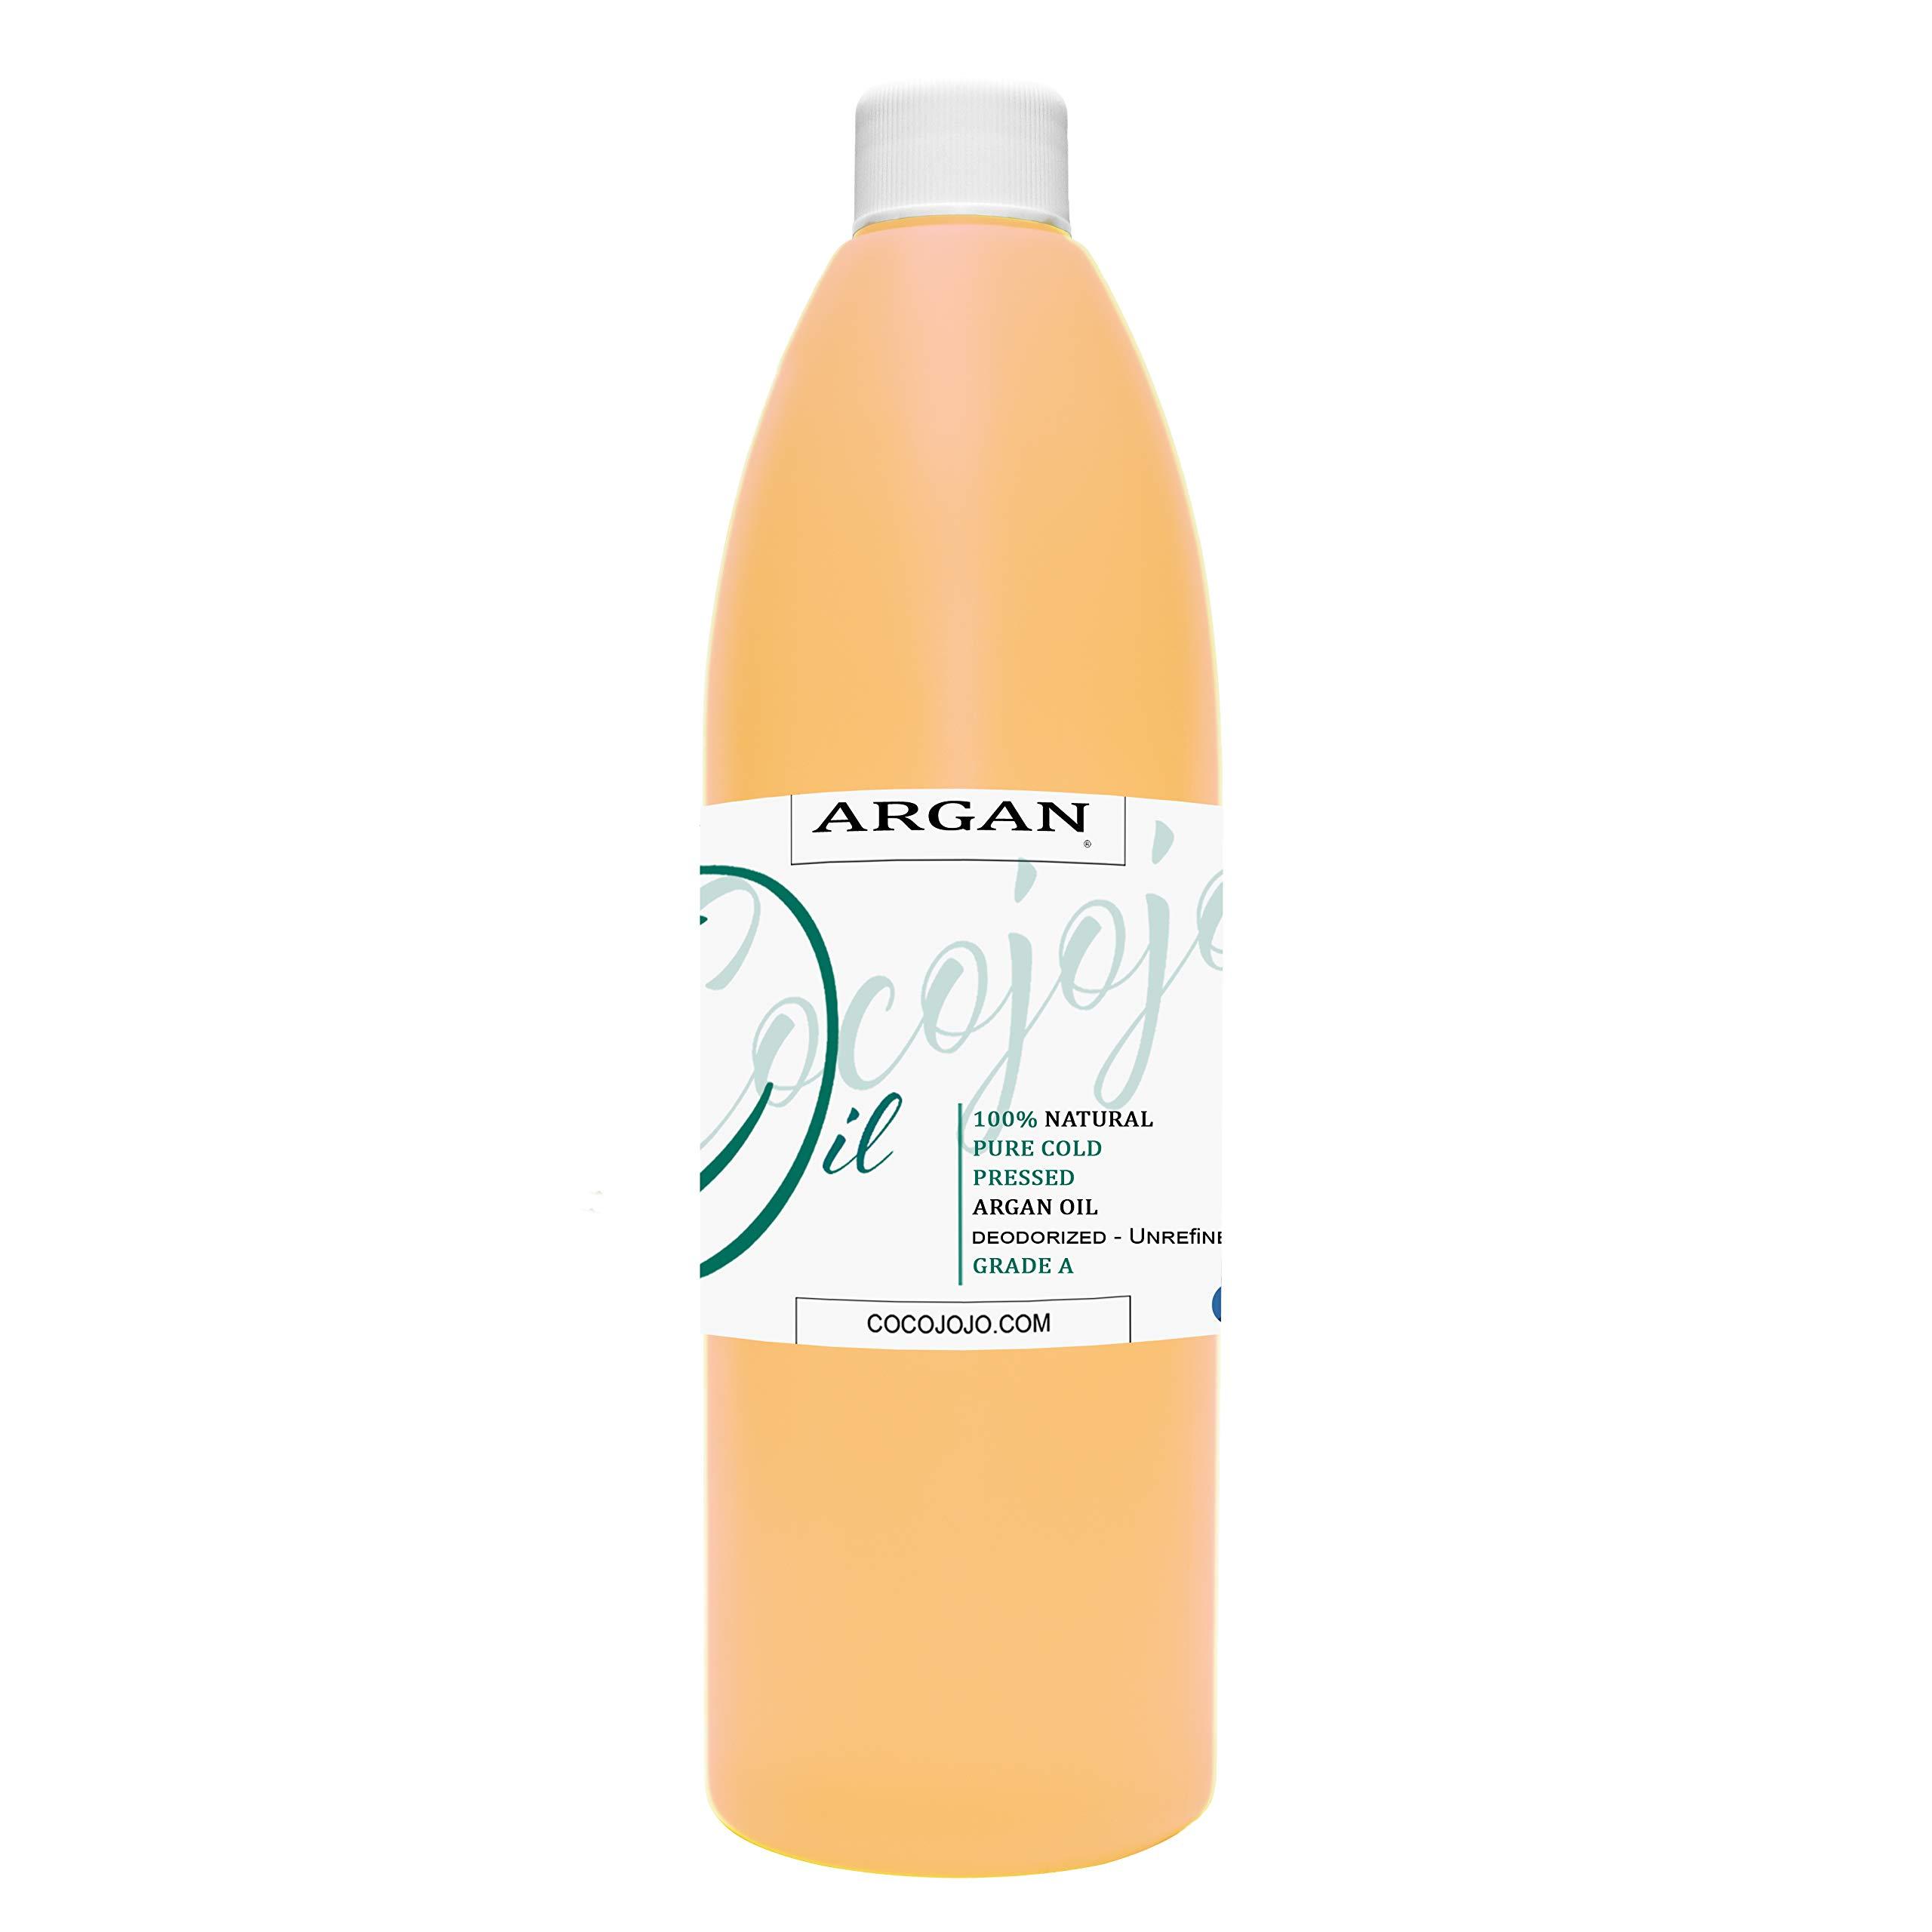 Argan Oil -Cold Pressed 16 oz 100% Pure Natural Extra Virgin Unrefined Grade-a Argan Moroccan Marrakesh Oil Moisturizer Hair Face Lips Body Scalp Skin Hair